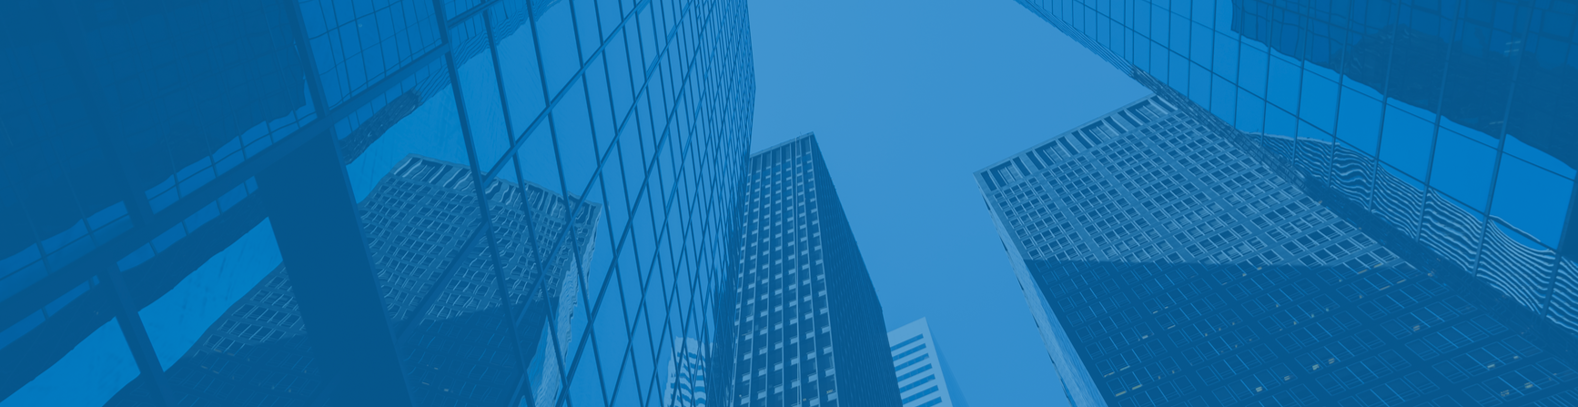 swissfinance_service entreprise particuliers_banque investissements